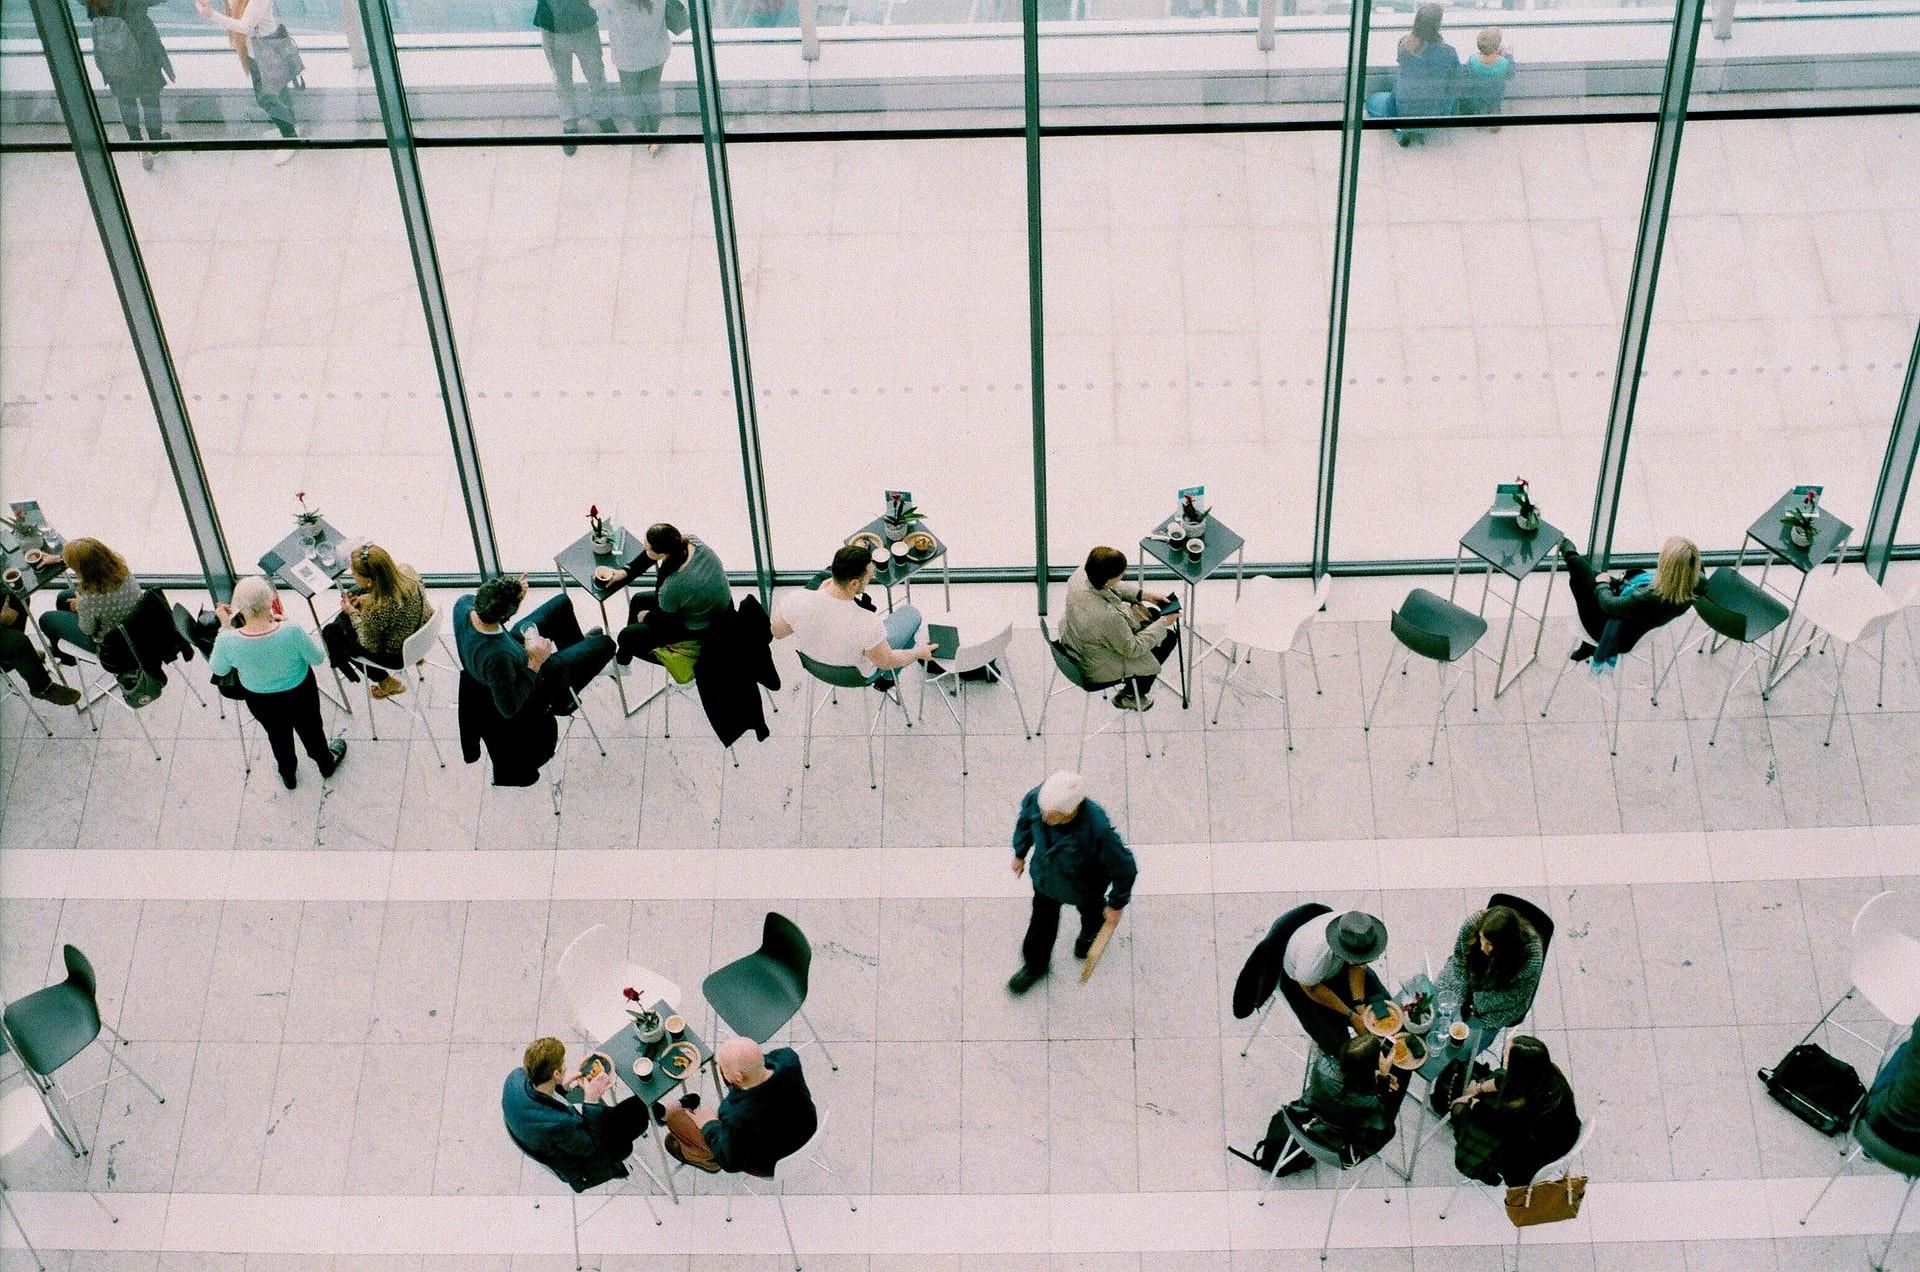 A café busy with customers